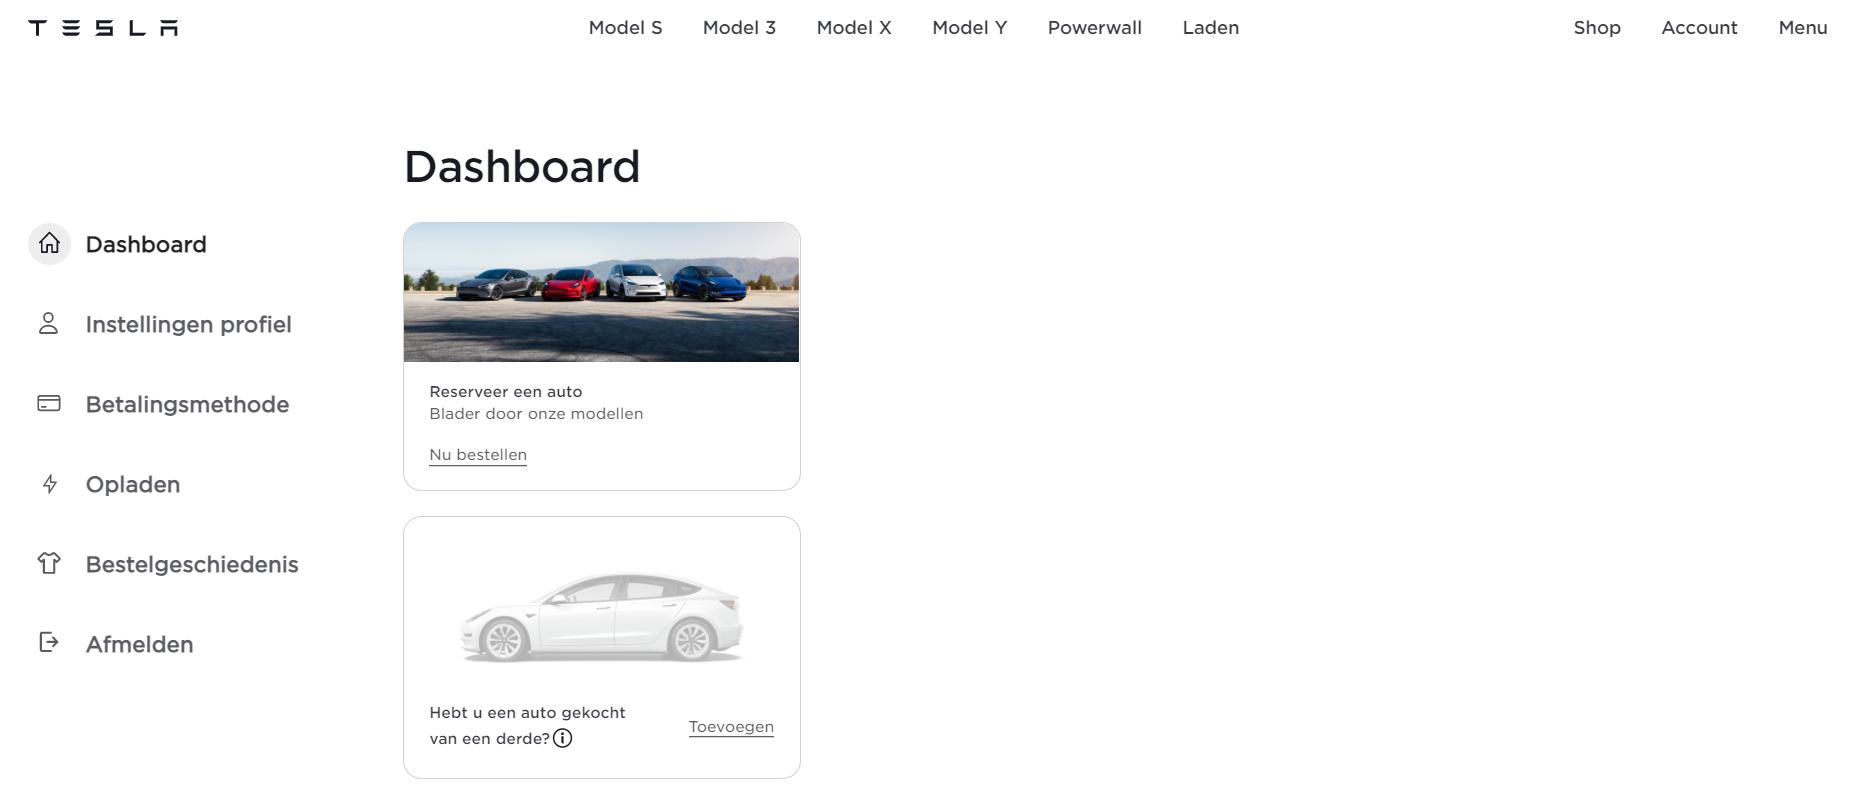 Tesla Web Account M.png